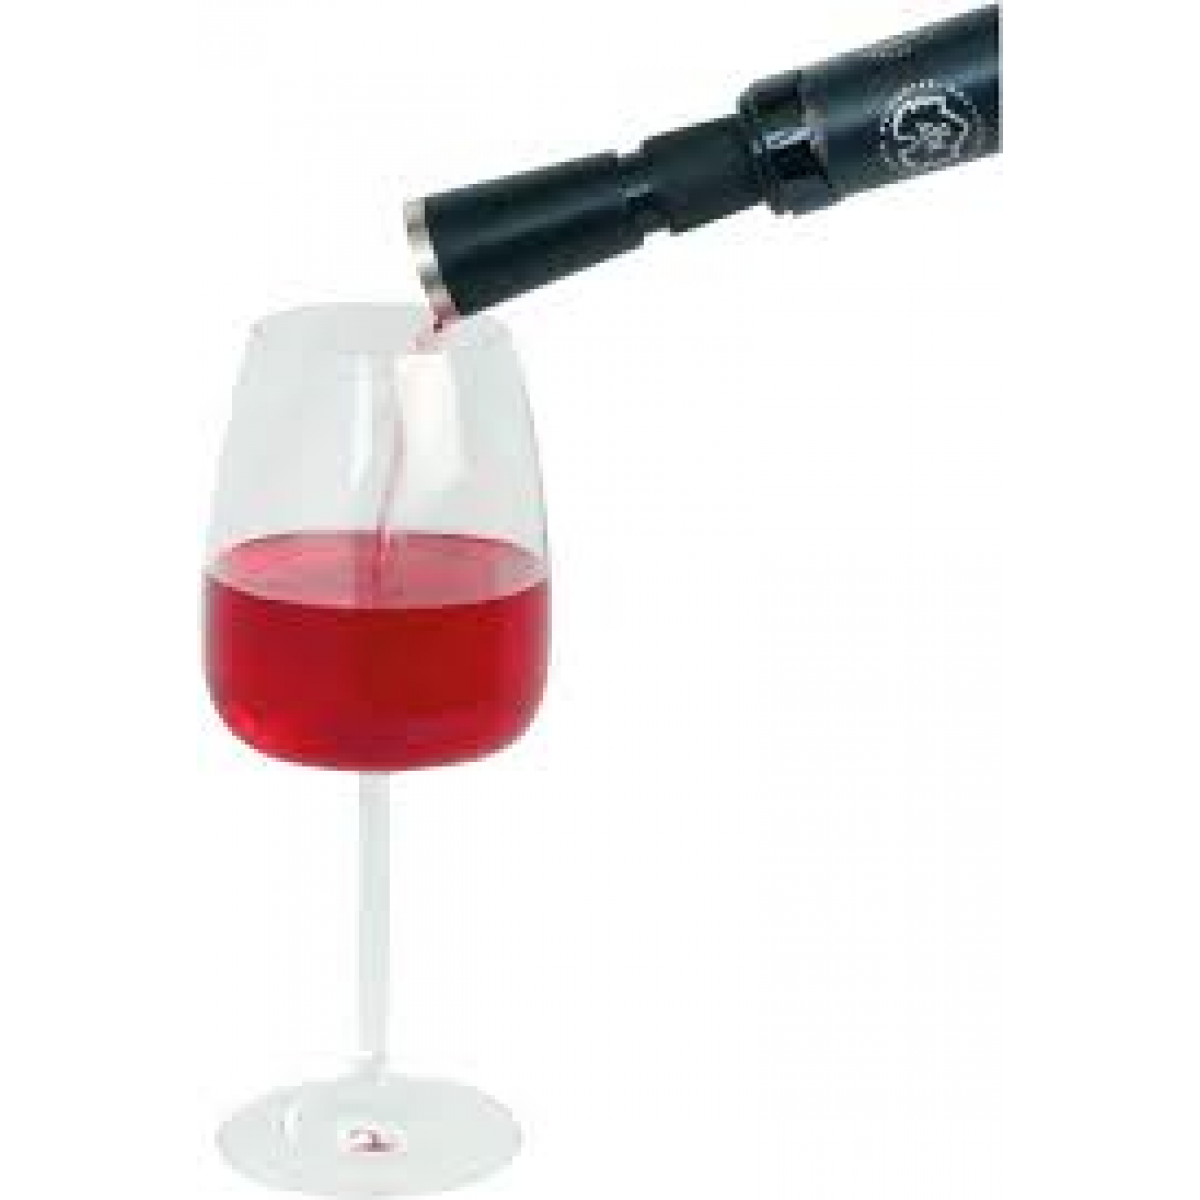 PATENT Vinilter - Wine twister